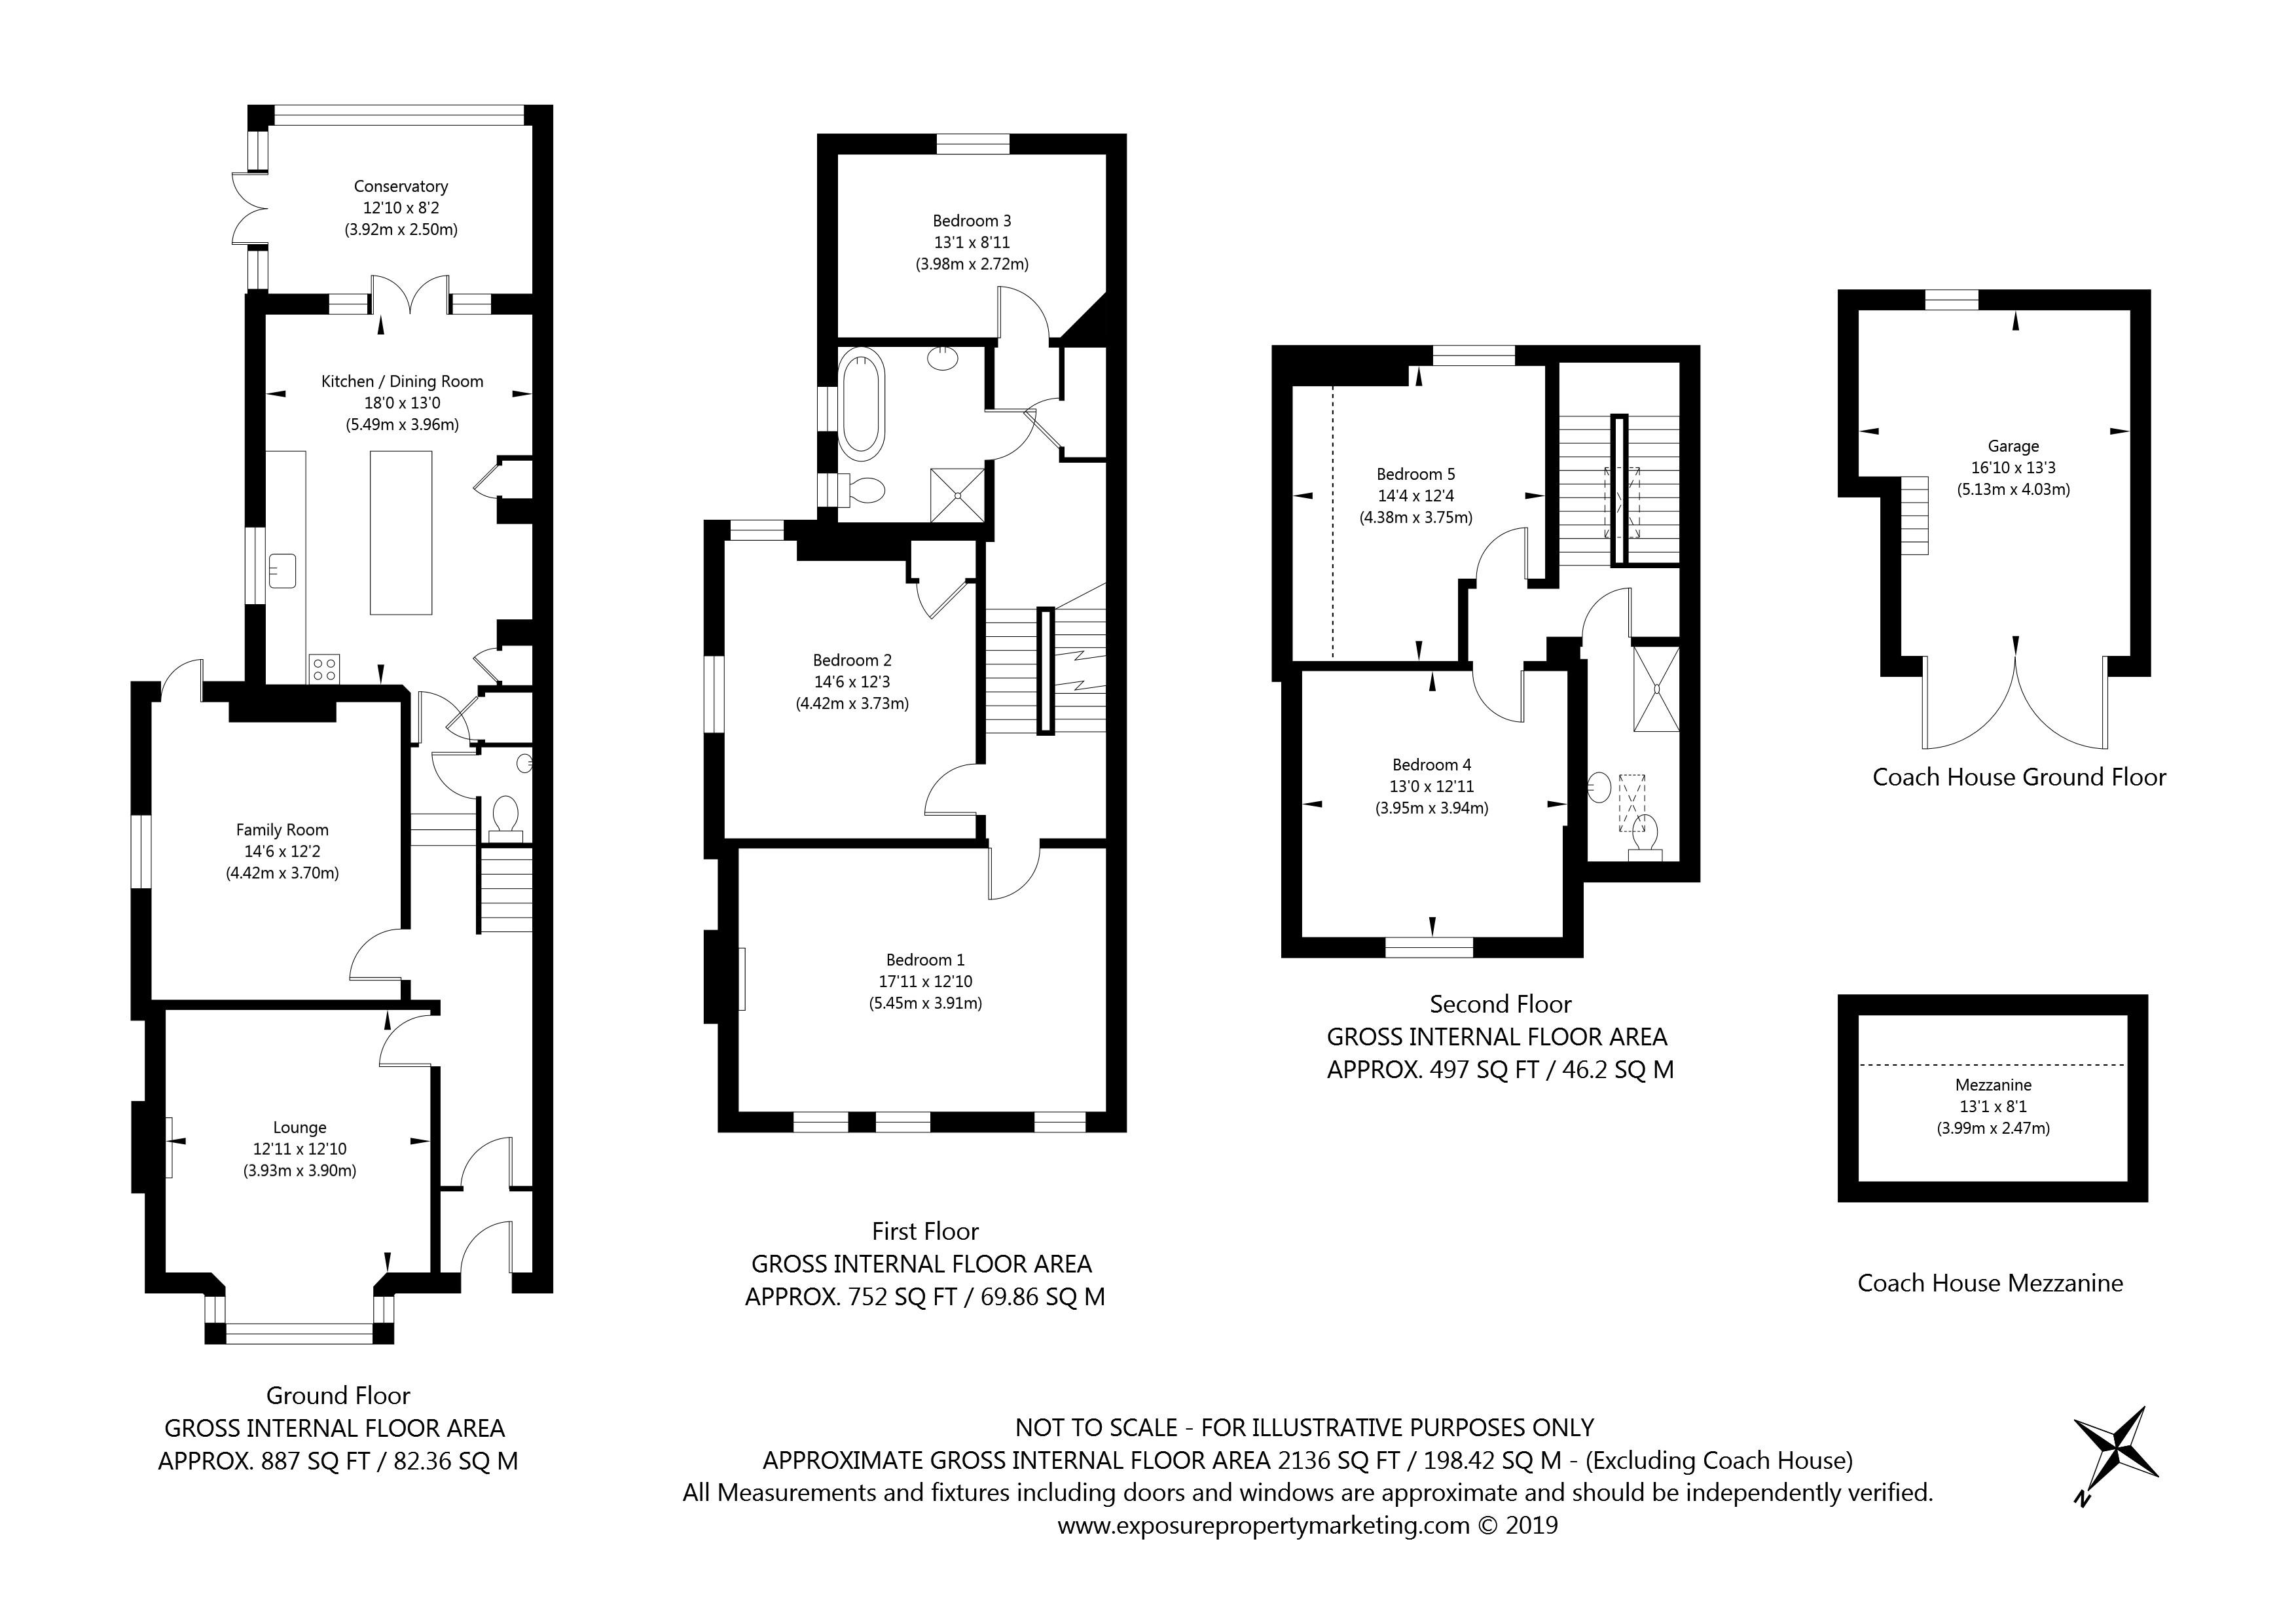 Burton Stone Lane, York property floorplan